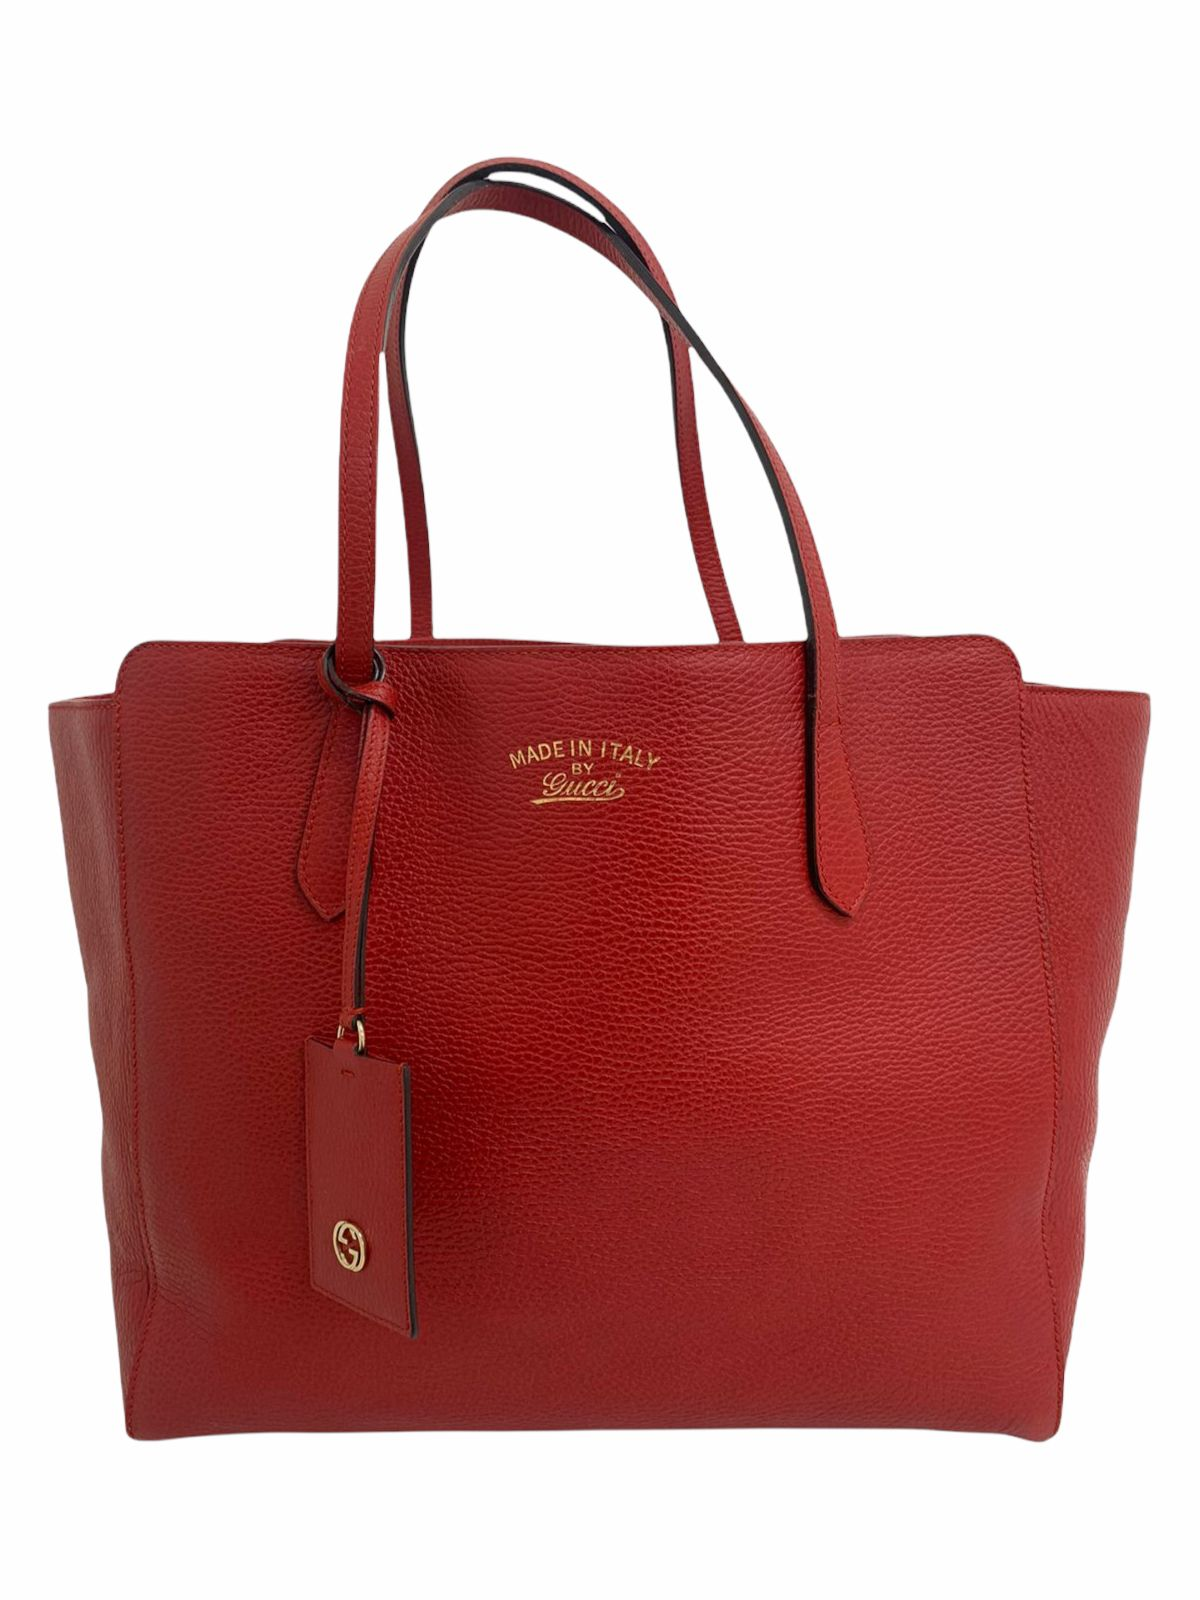 Bolsa Gucci Swing Tote Medium Vermelha